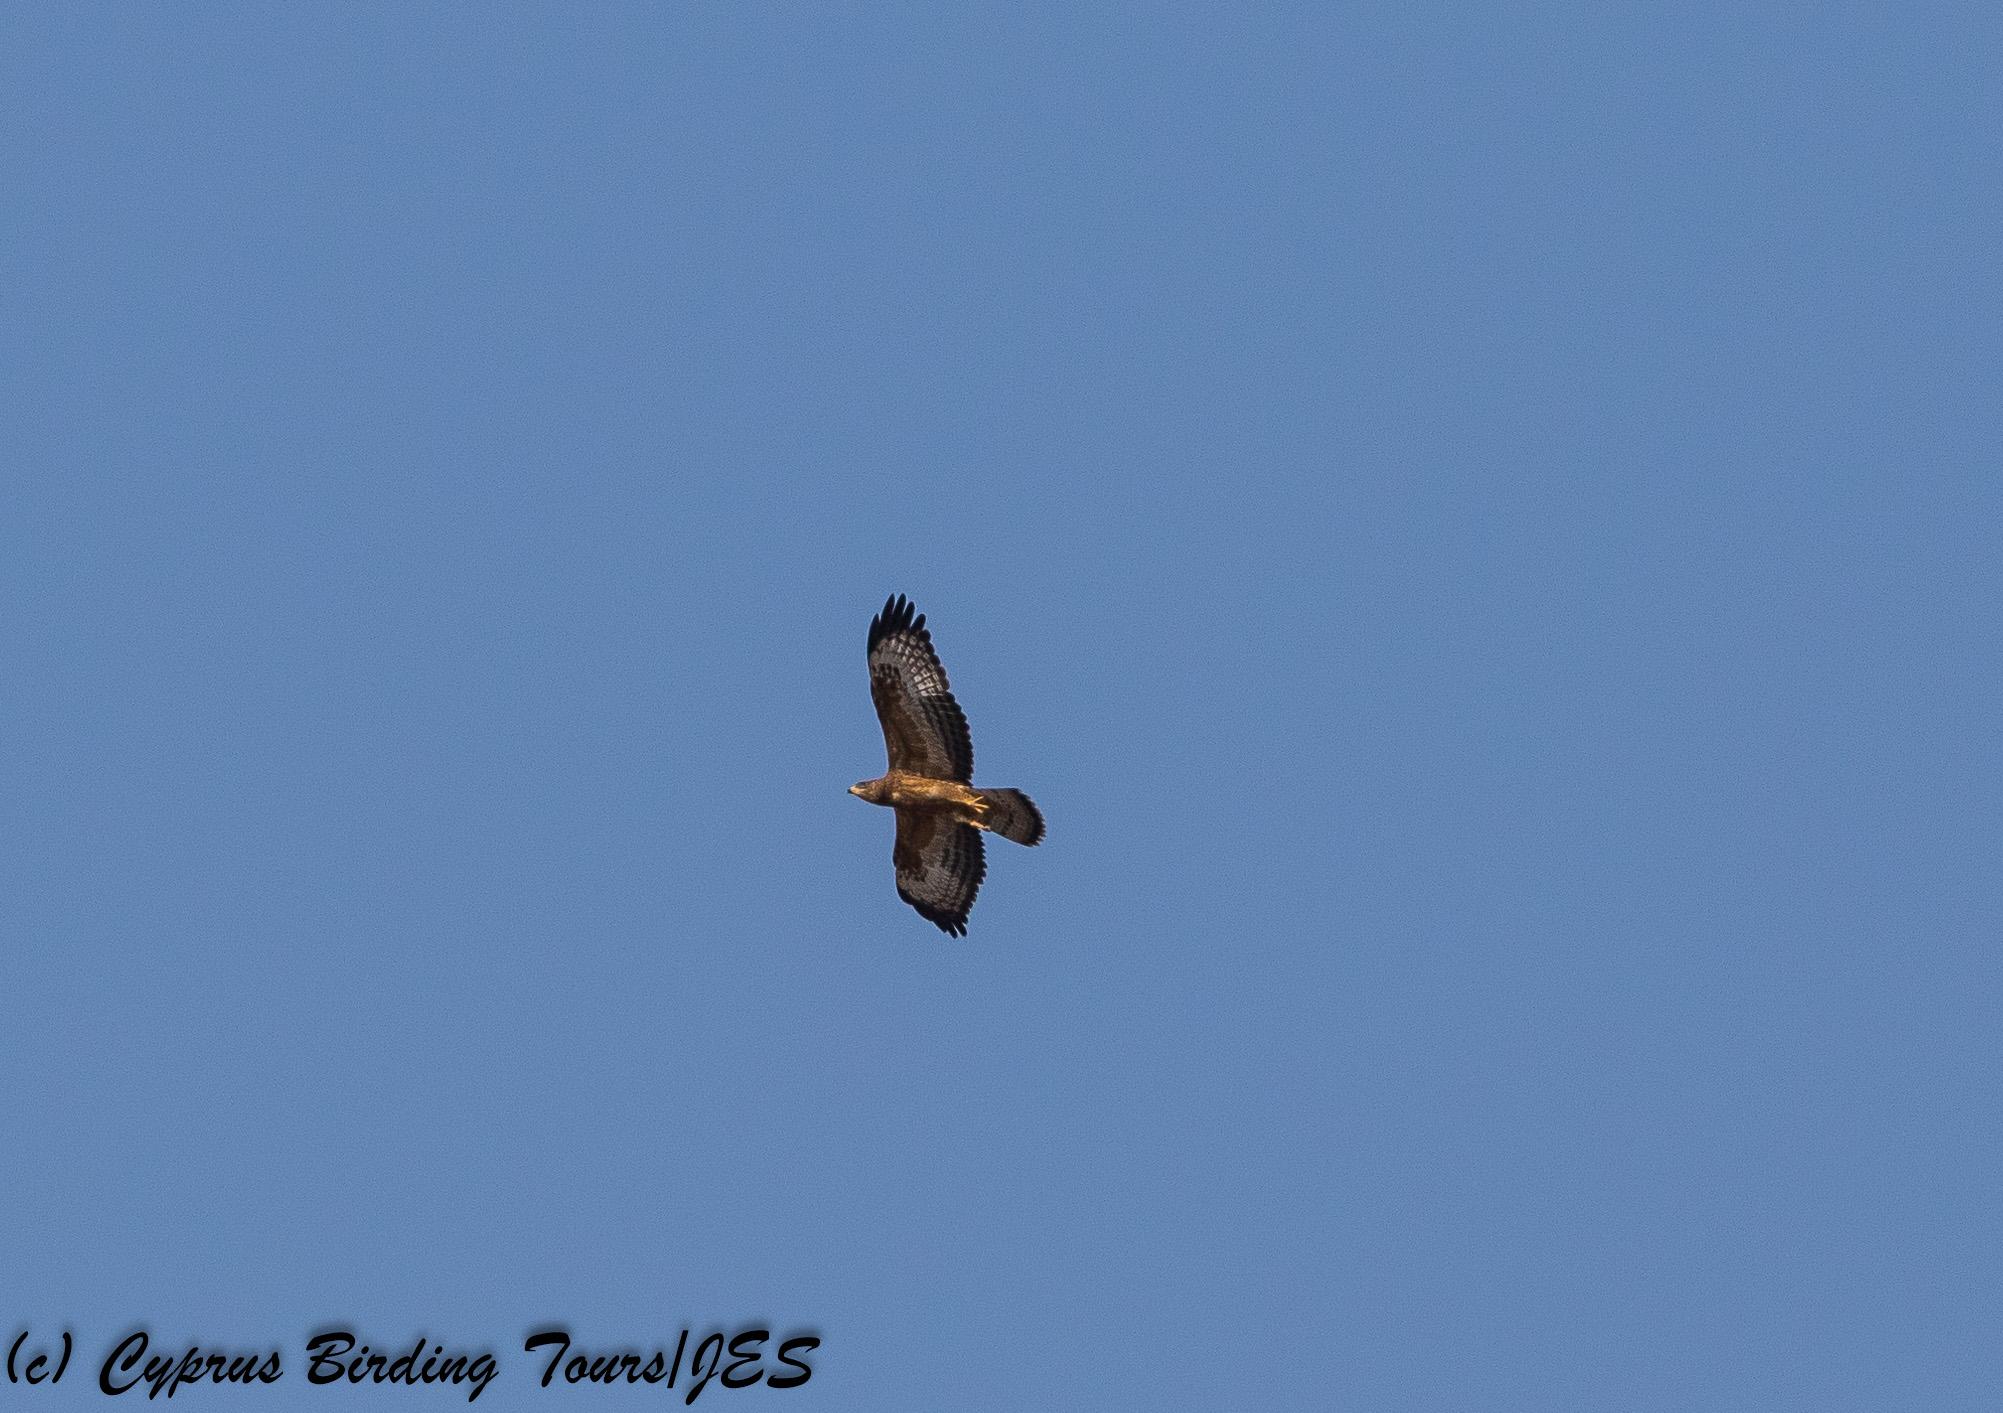 European Honey Buzzard, Phasouri Reed Beds 13th September 2017 (c) Cyprus Birding Tours